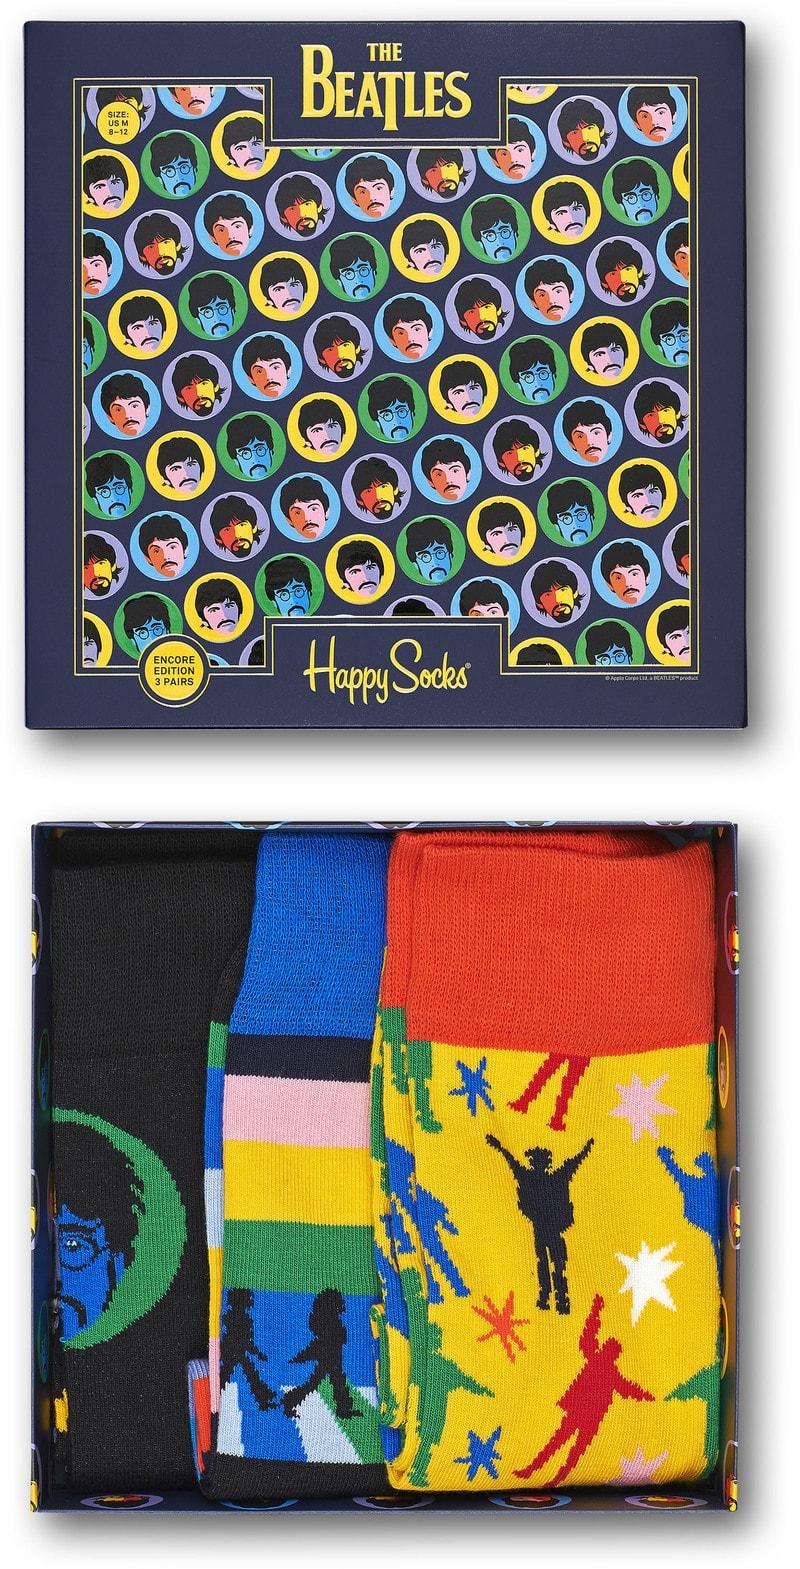 Happy Socks The Beatles Gift Box foto 8